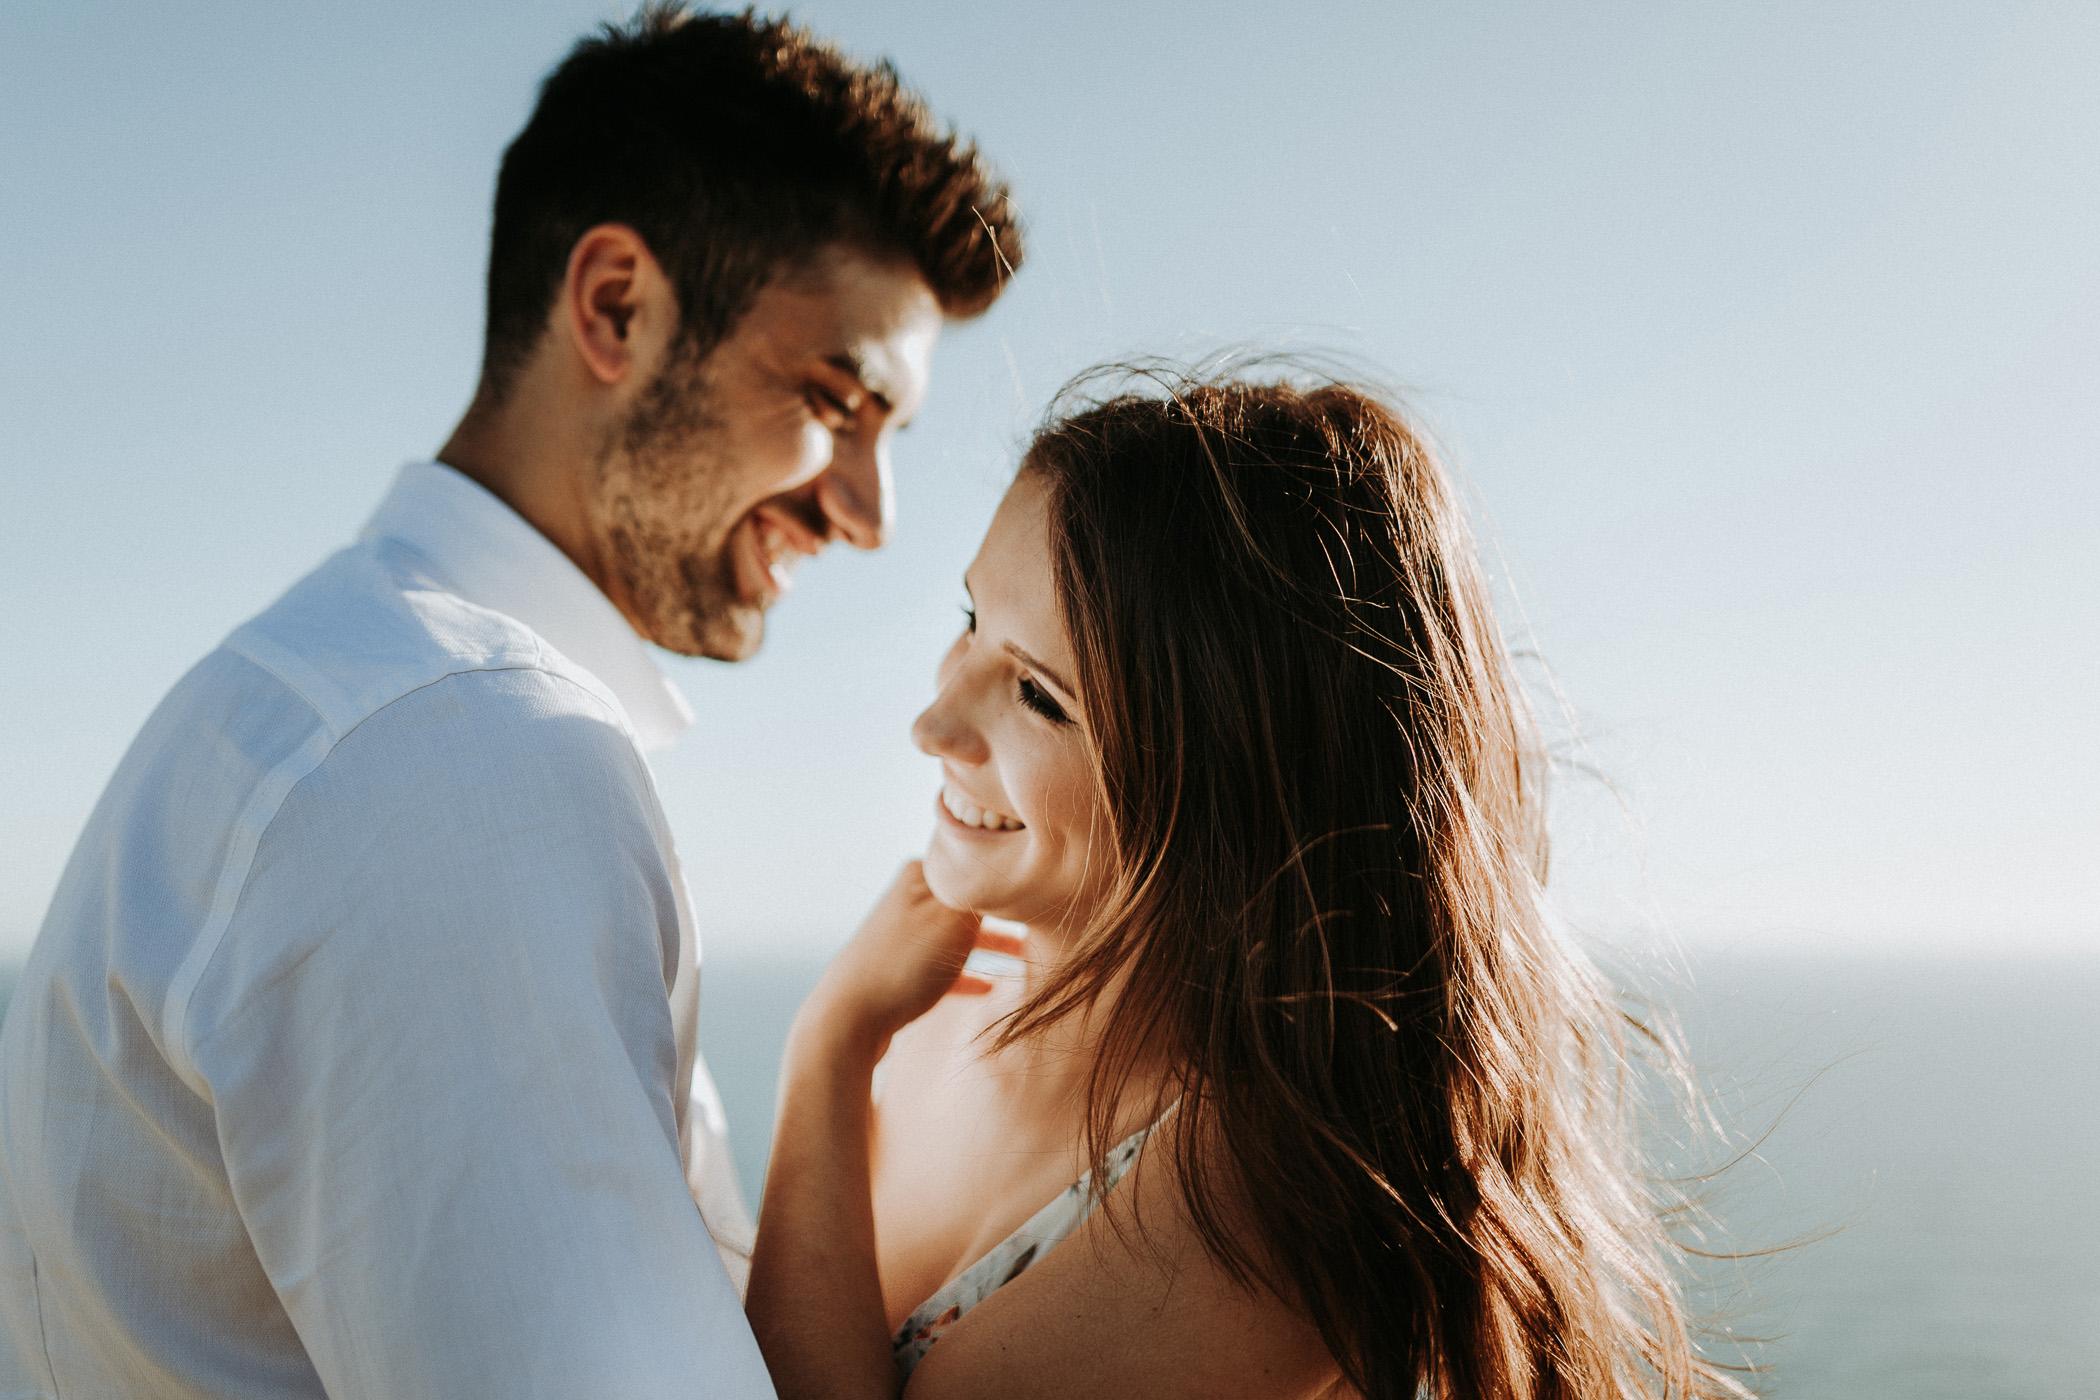 DanielaMarquardtPhotography_wedding_elopement_mallorca_spain_calapi_palma_lauraandtoni_254